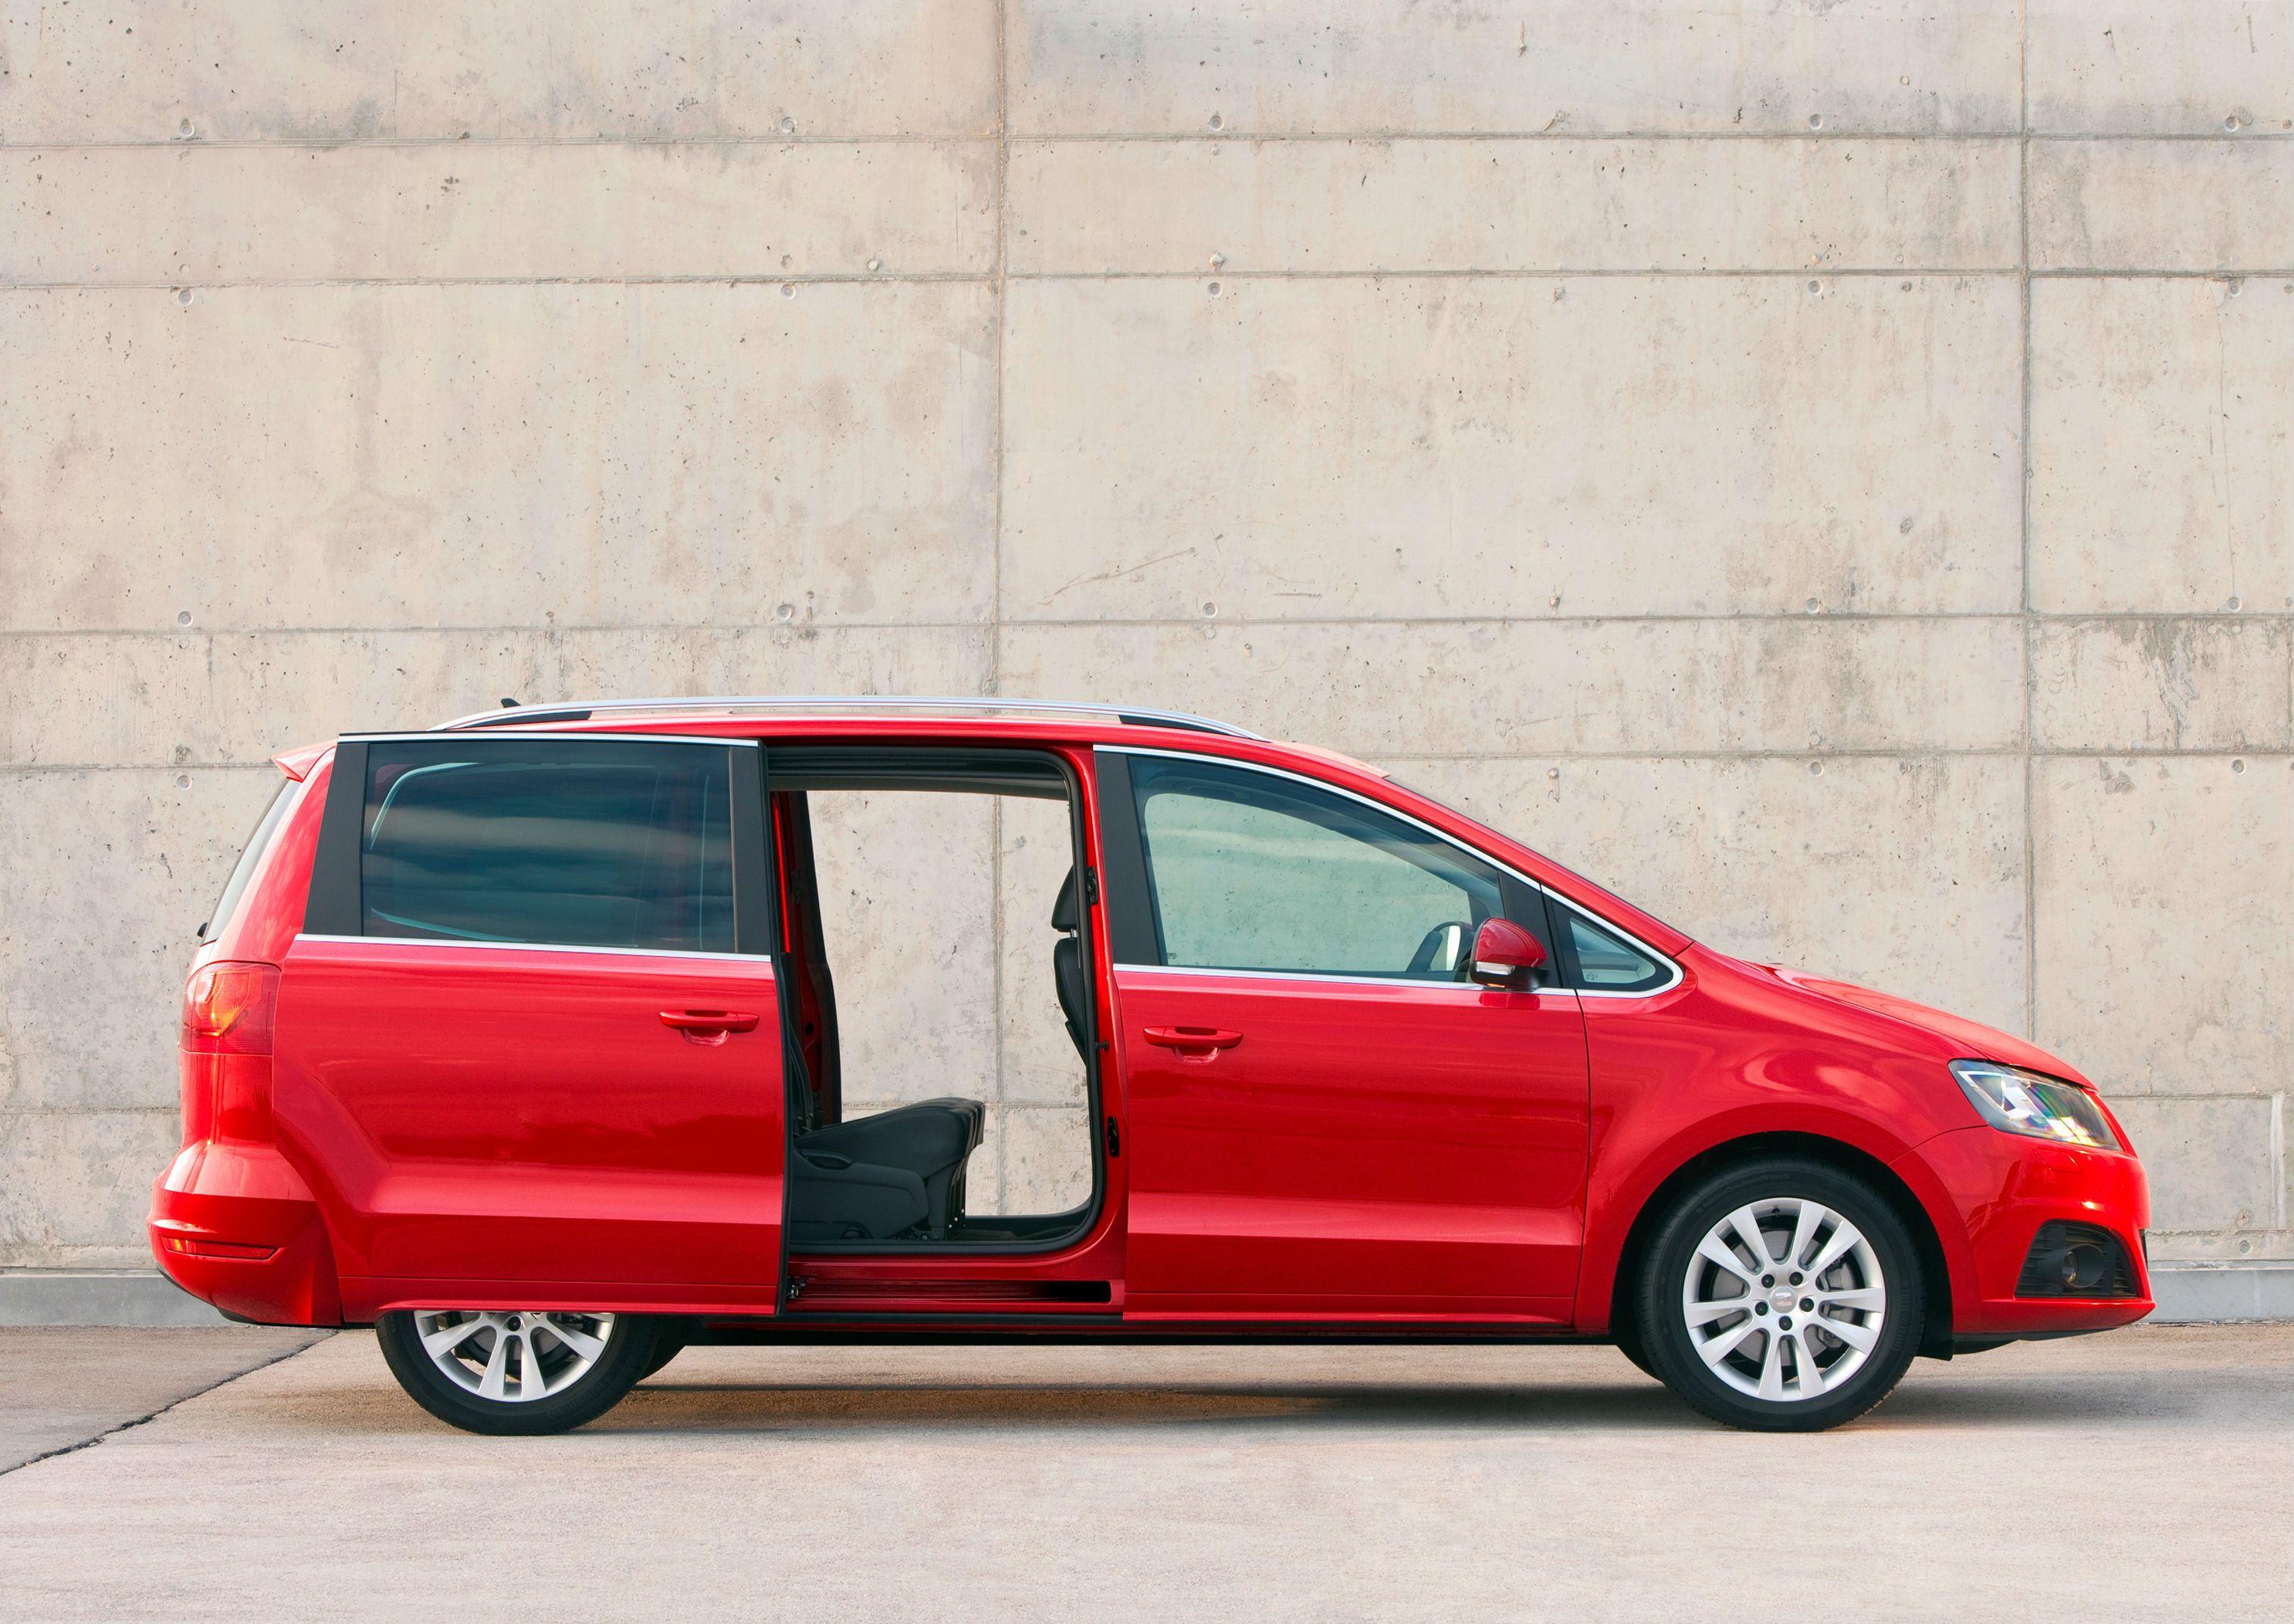 Image result for interior economy 7 seater van with automatic image result for interior economy 7 seater van with automatic sliding door vtopaller Gallery